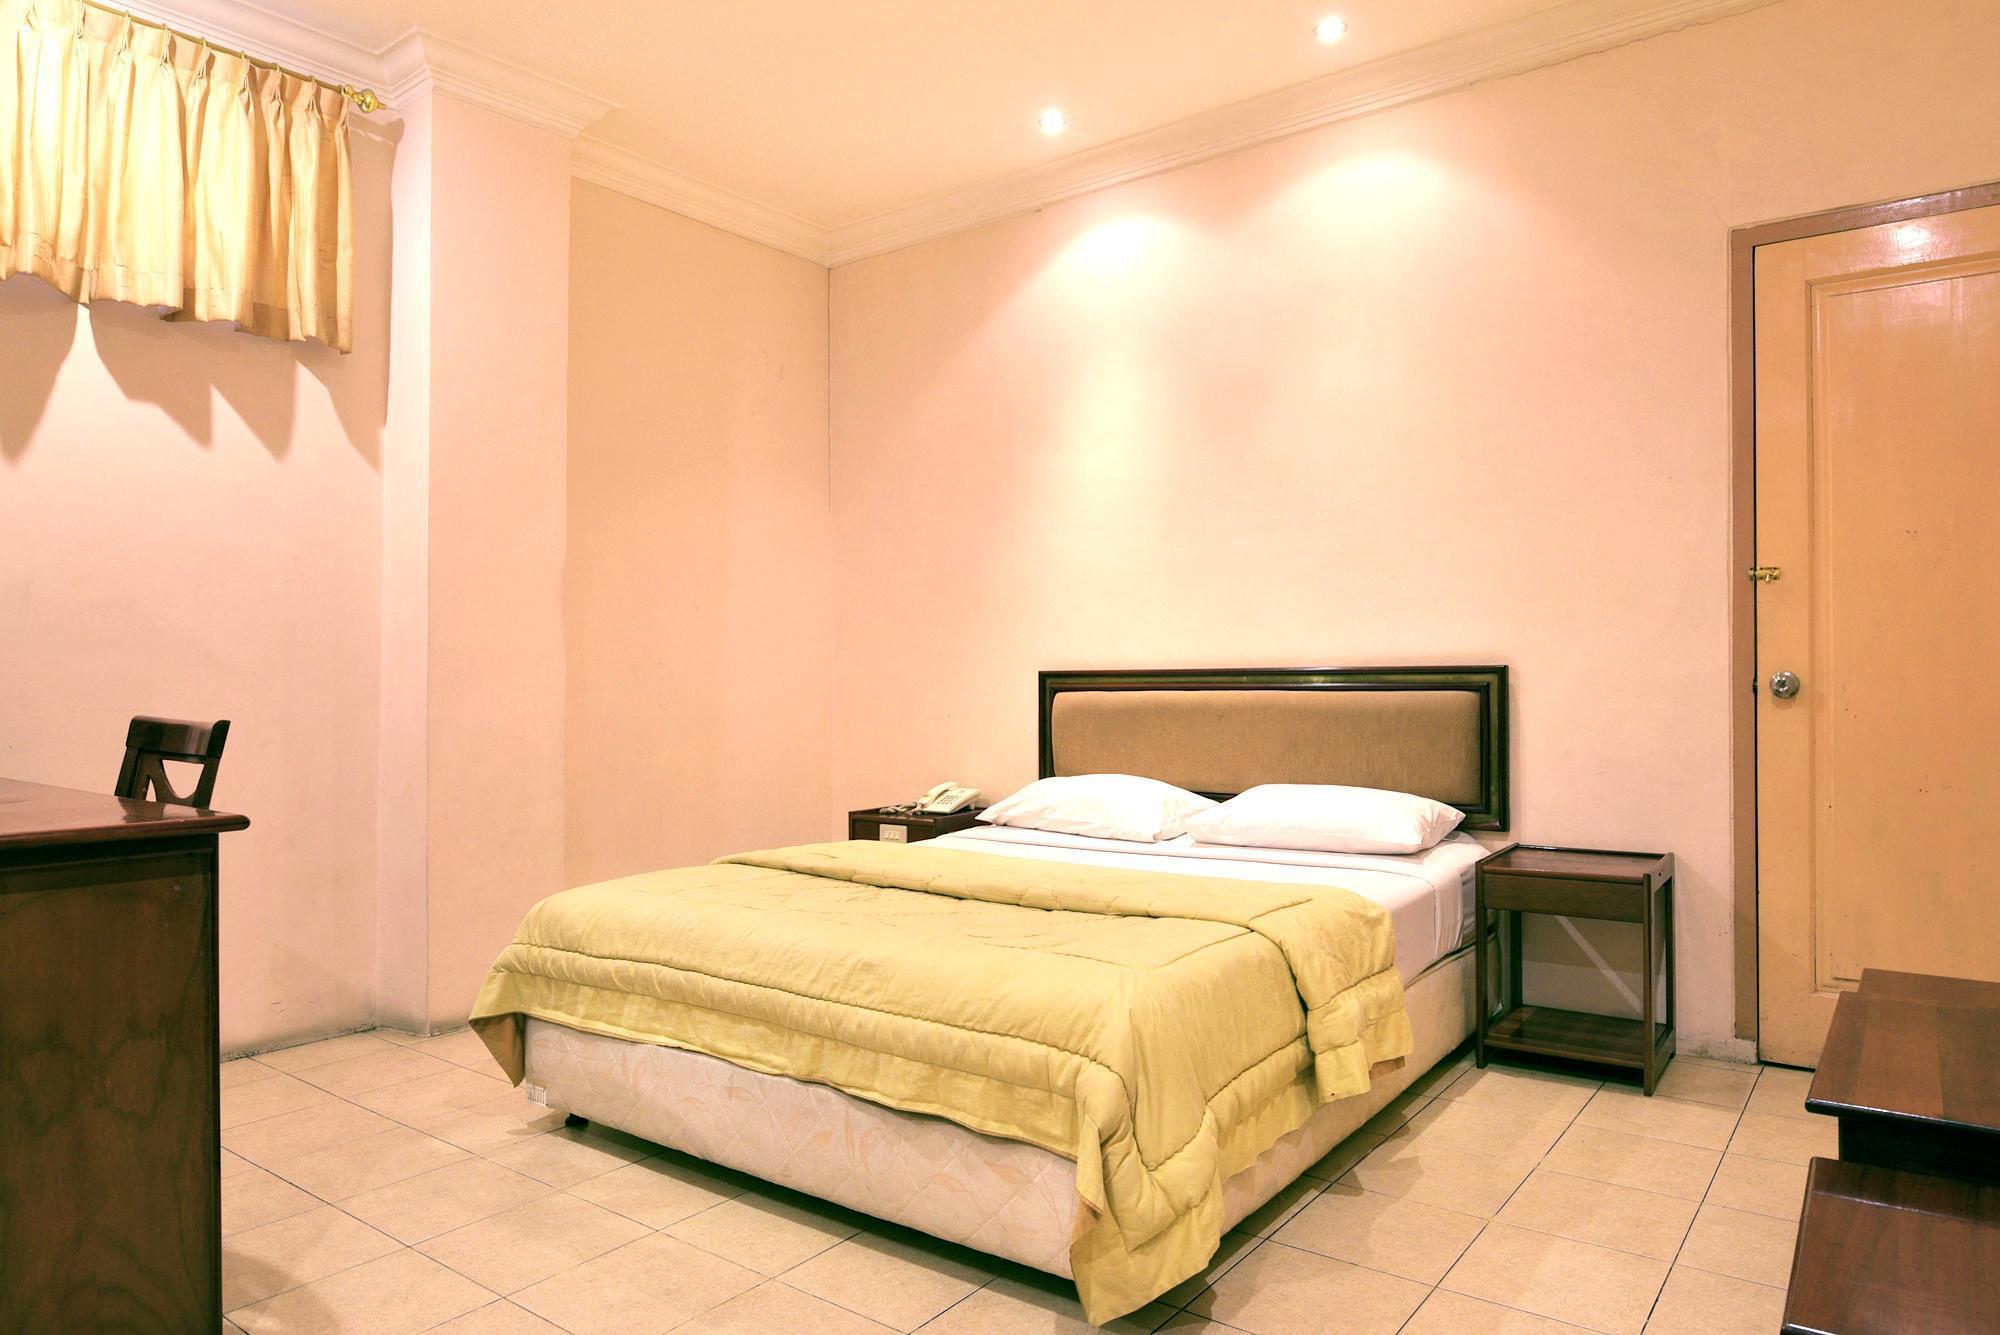 Siwah Hotel Aceh, Banda Aceh